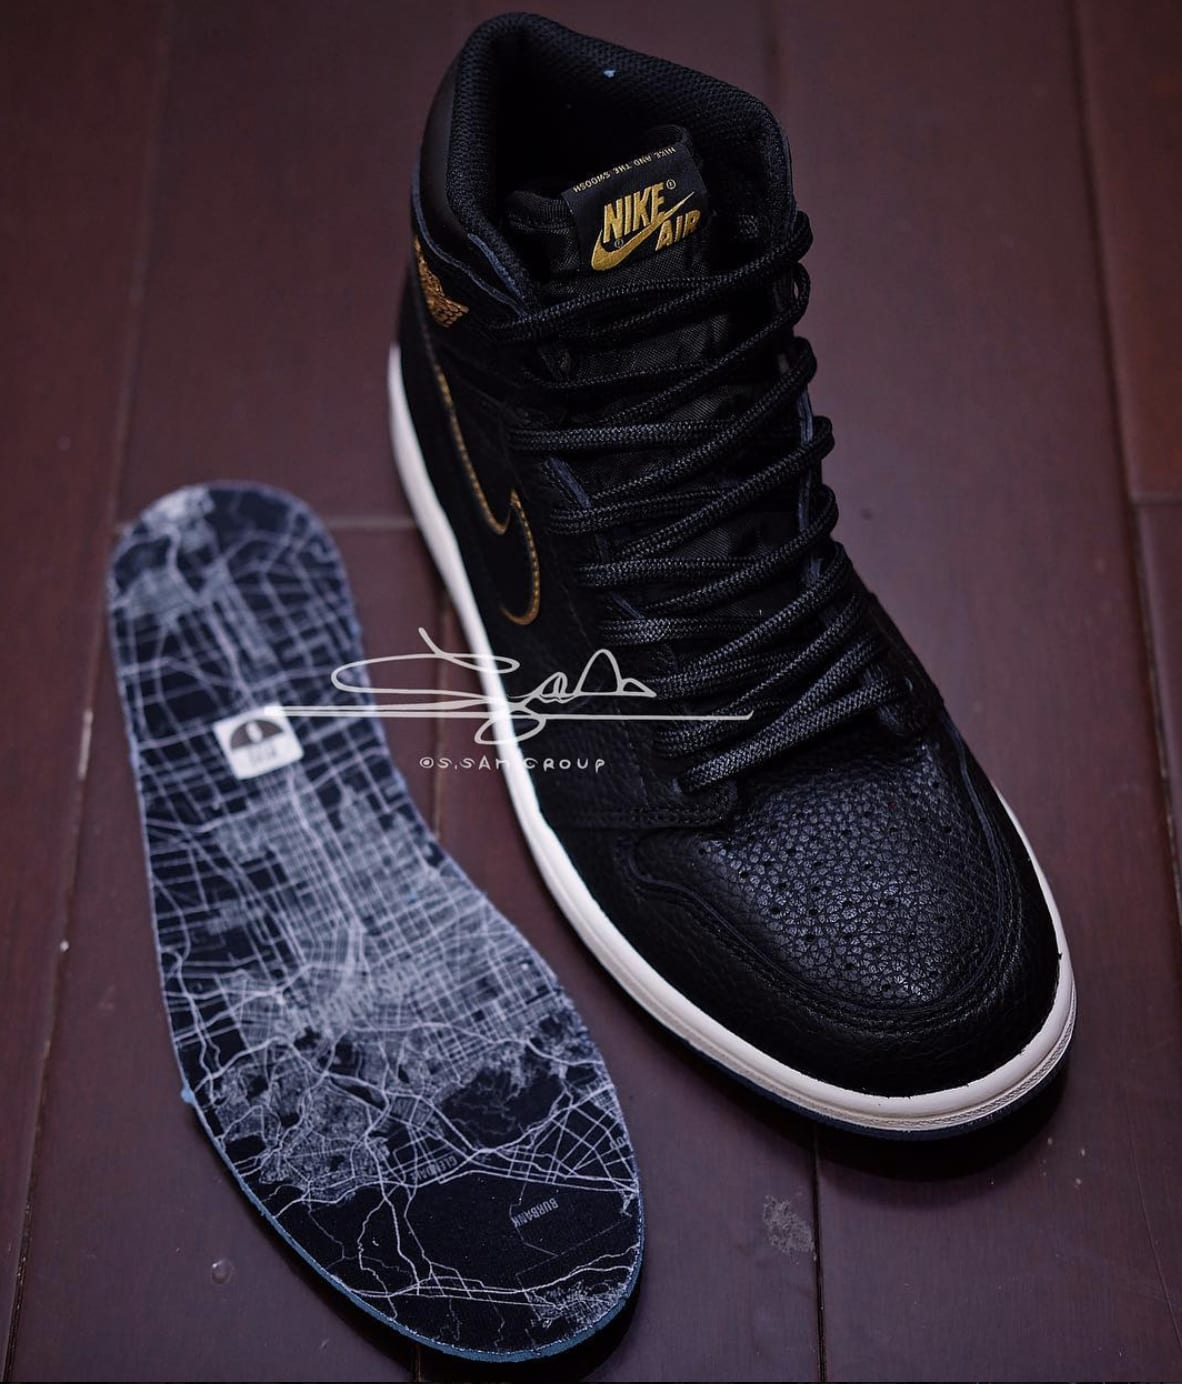 2018 Men Air Jordan 1 All Star Black Gold Shoes